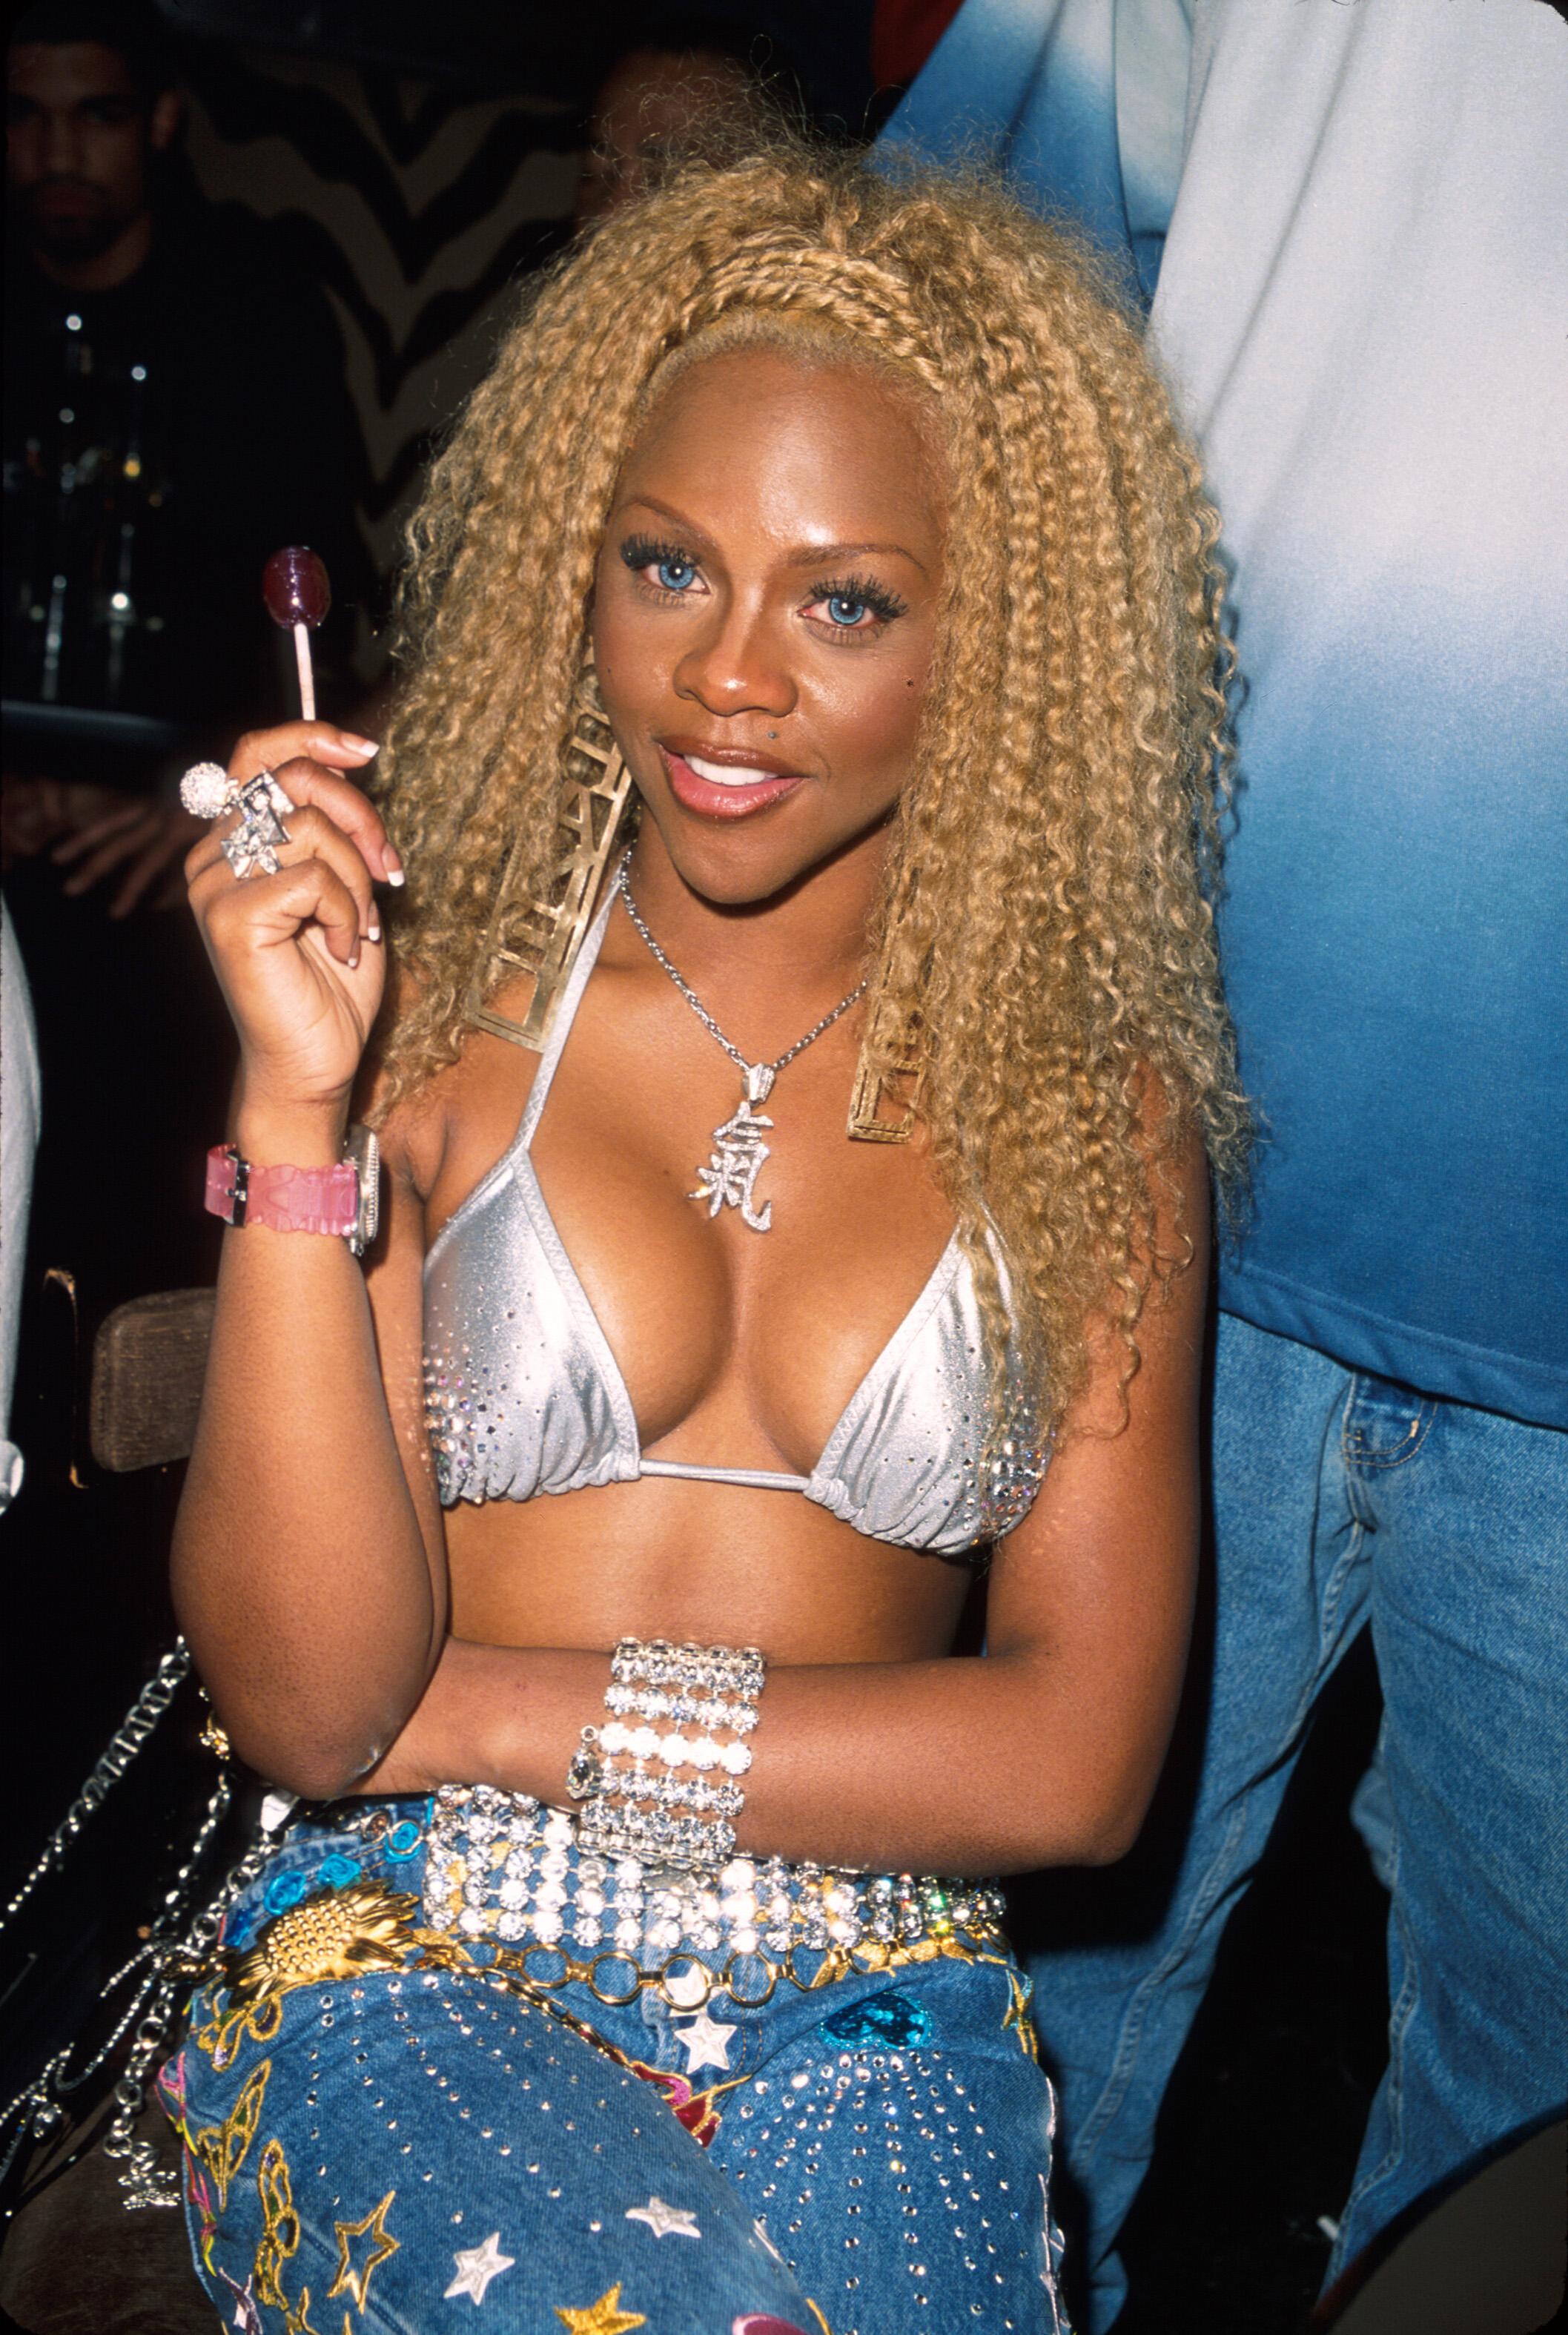 Lil' Kim, September 29, 2000